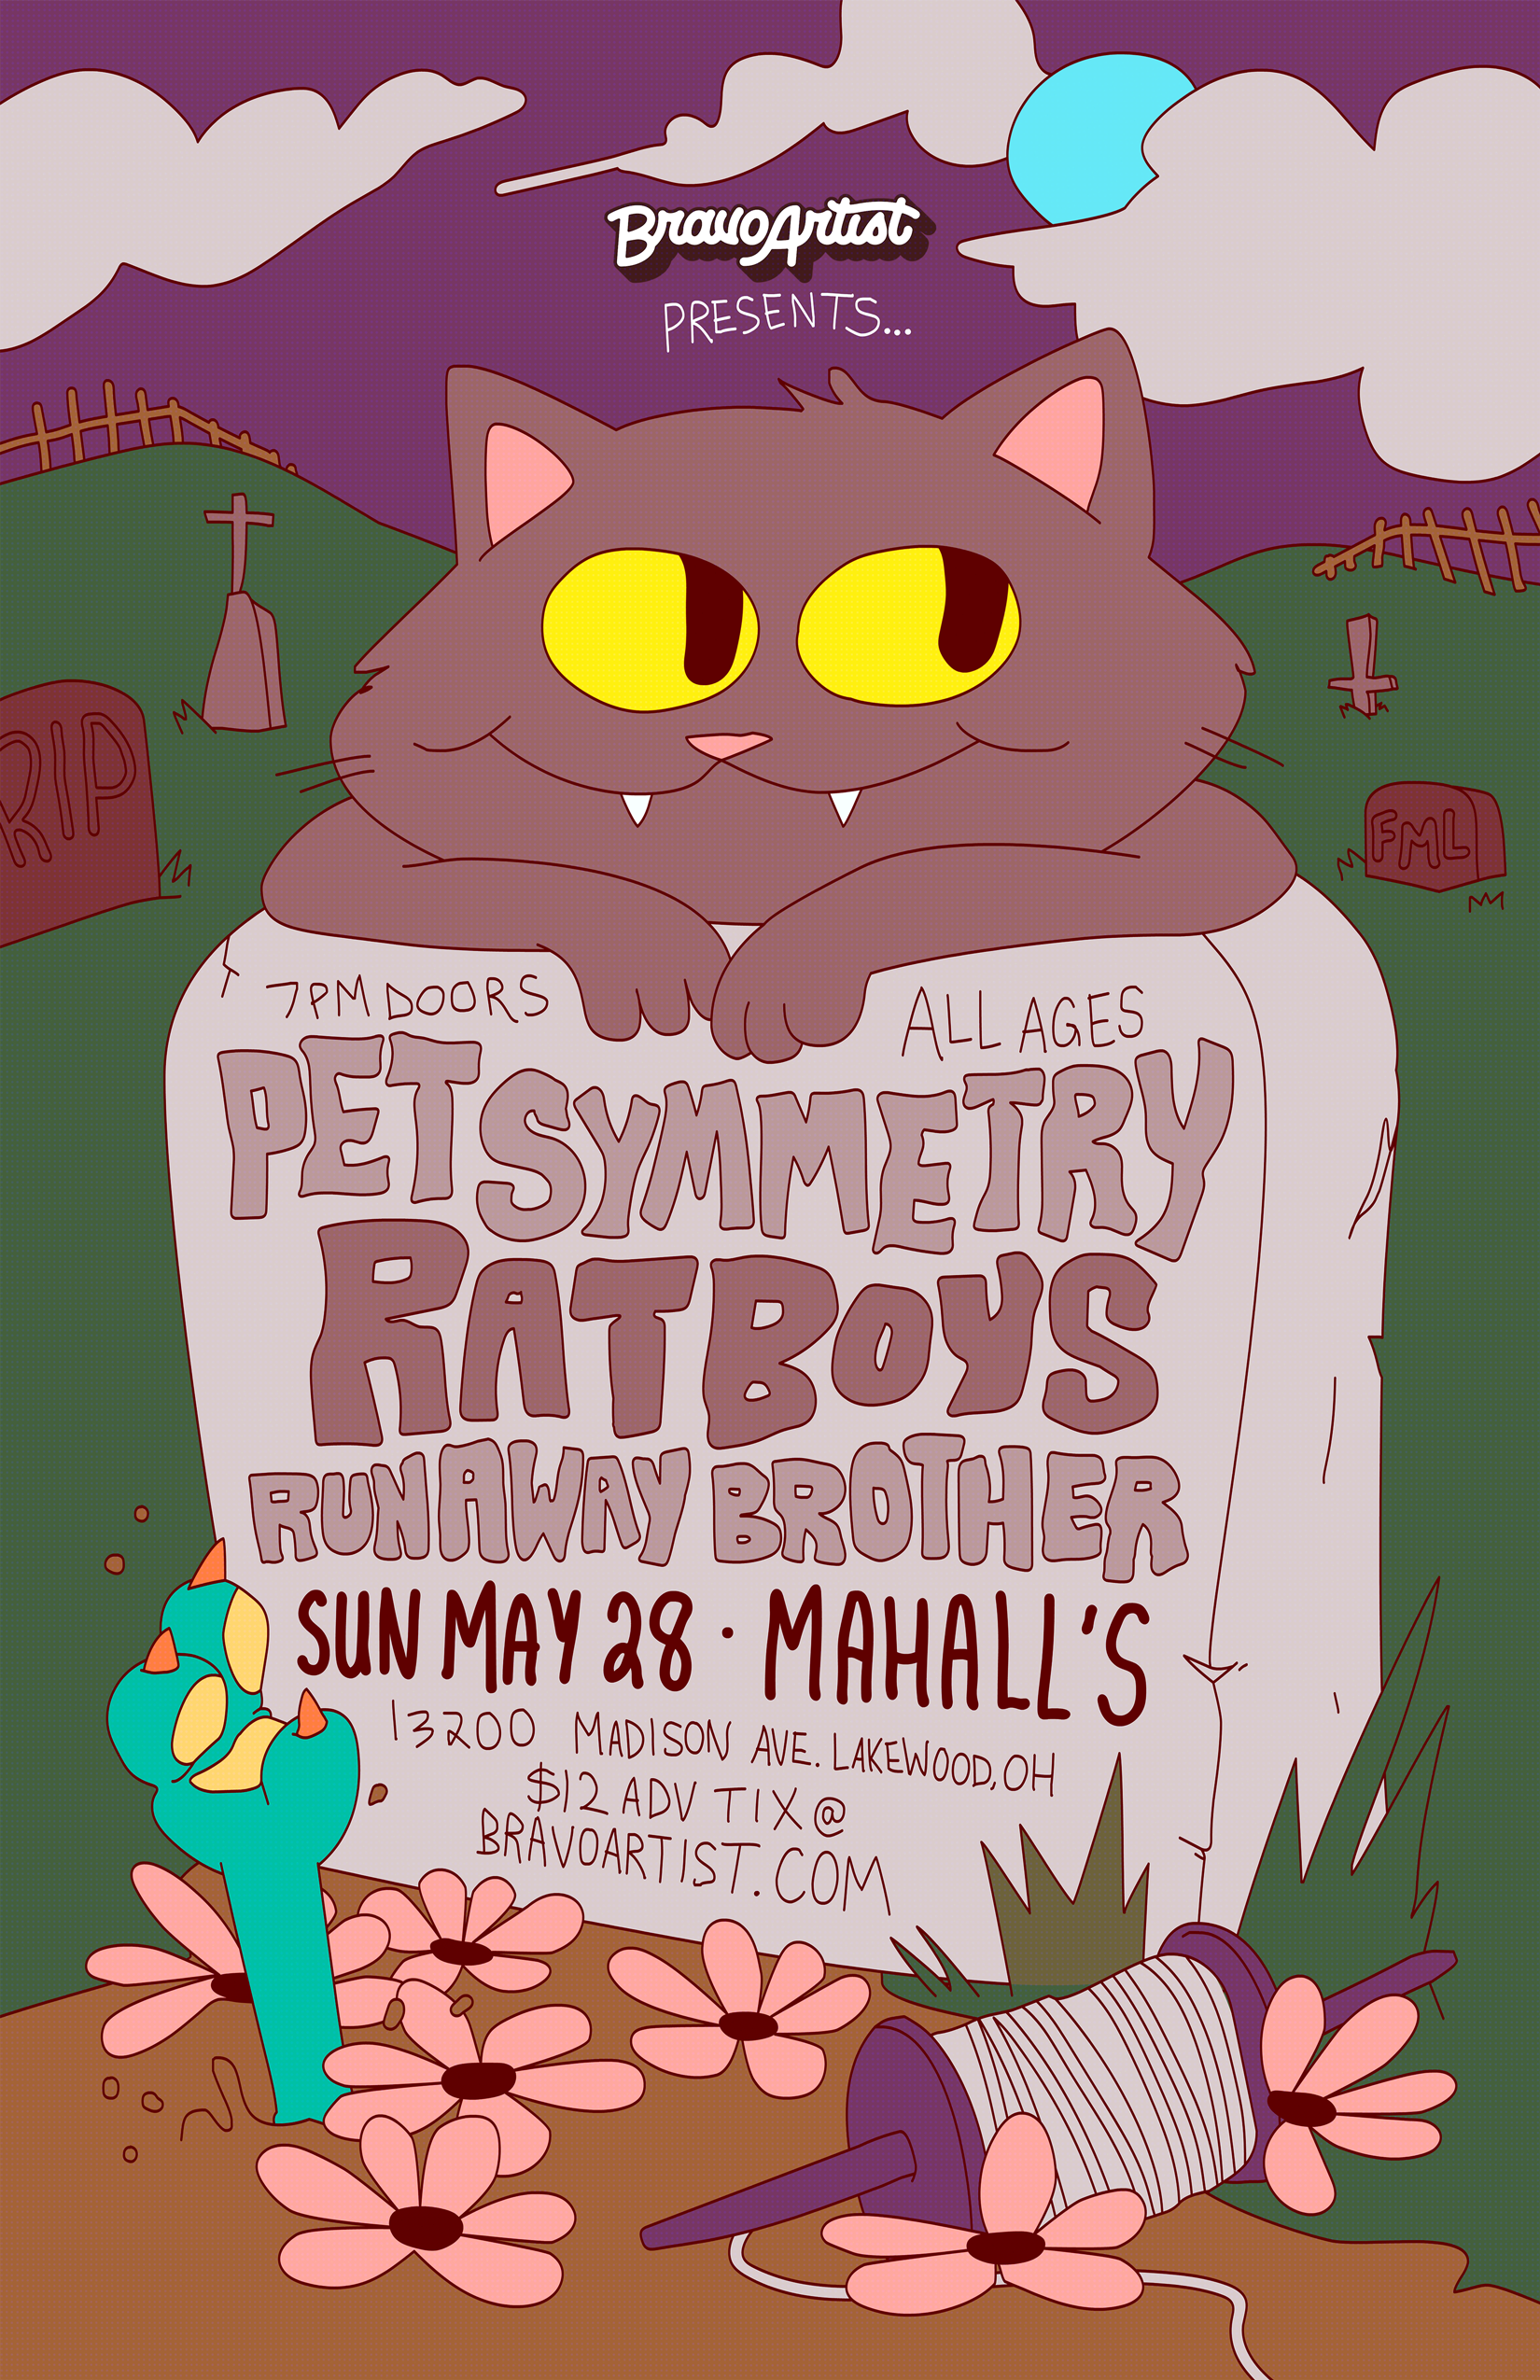 petsymmetry_web_small.png